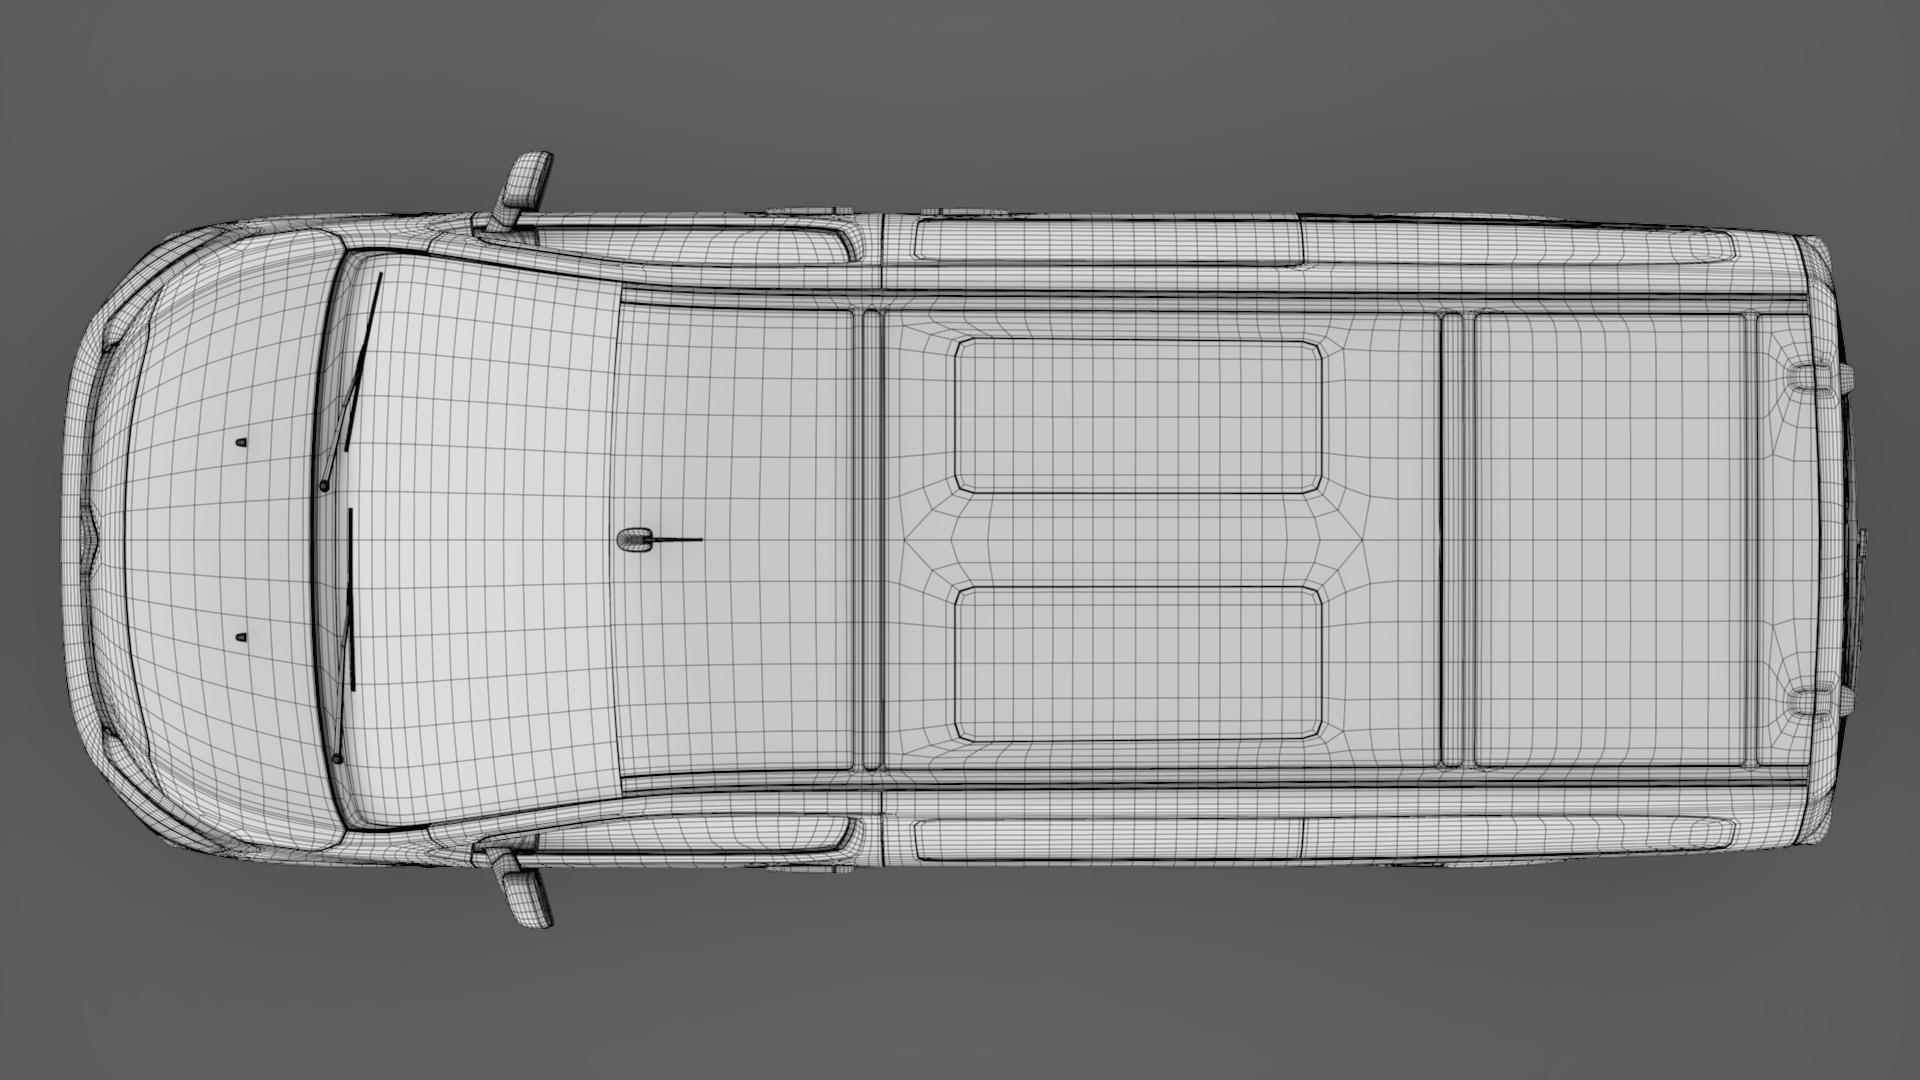 citroen spacetourer l3 2017 3d model 3ds max fbx c4d lwo ma mb hrc xsi obj 224384